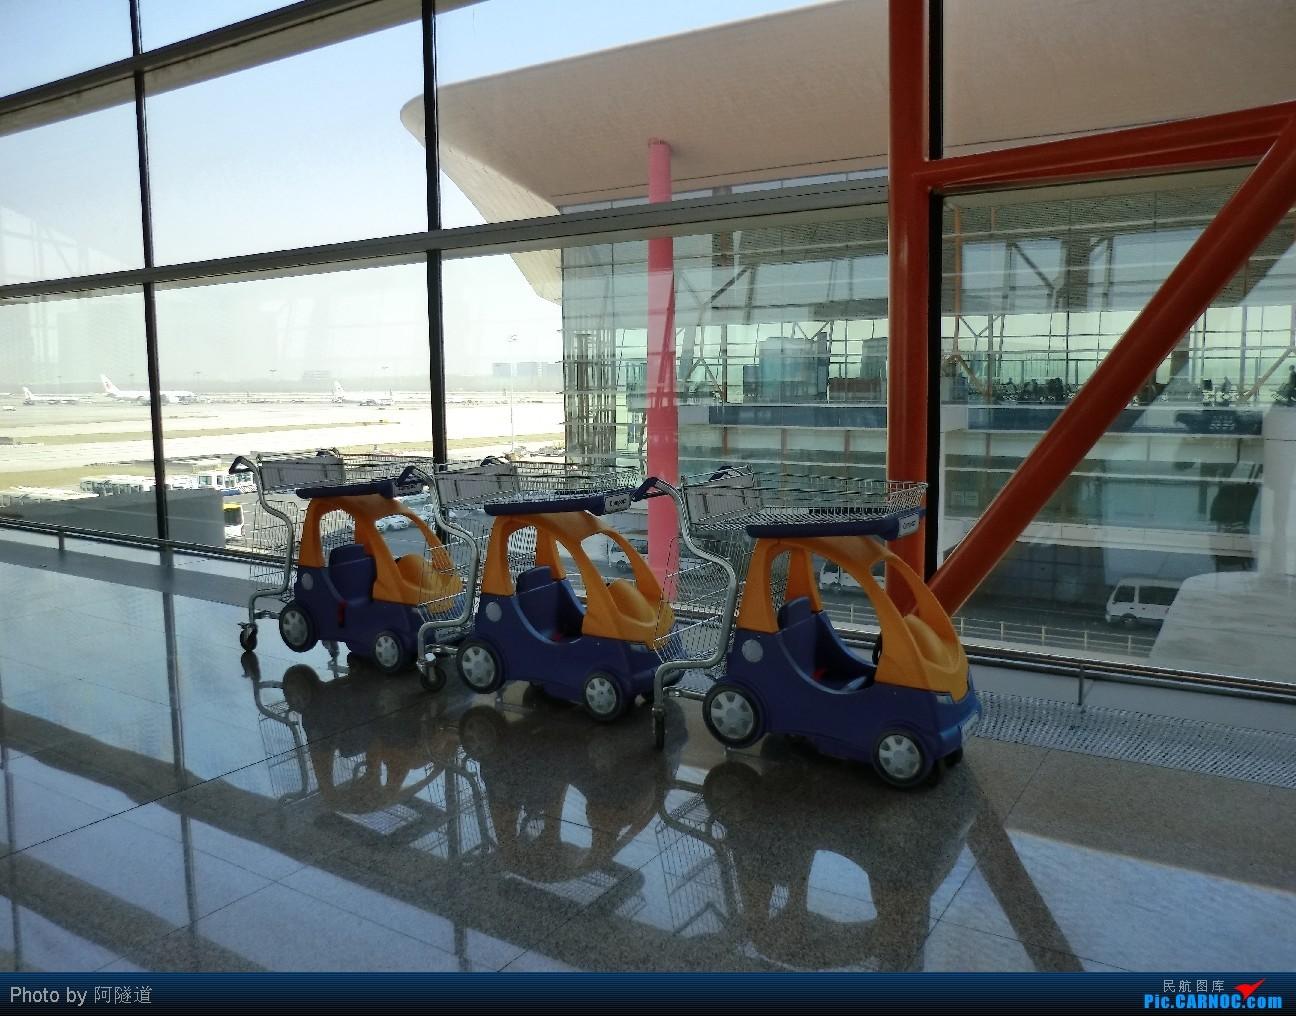 Re:[原创]偶妈的游记:pek-sha CA1517  sha-pek CA1832(上) 1   中国北京首都机场